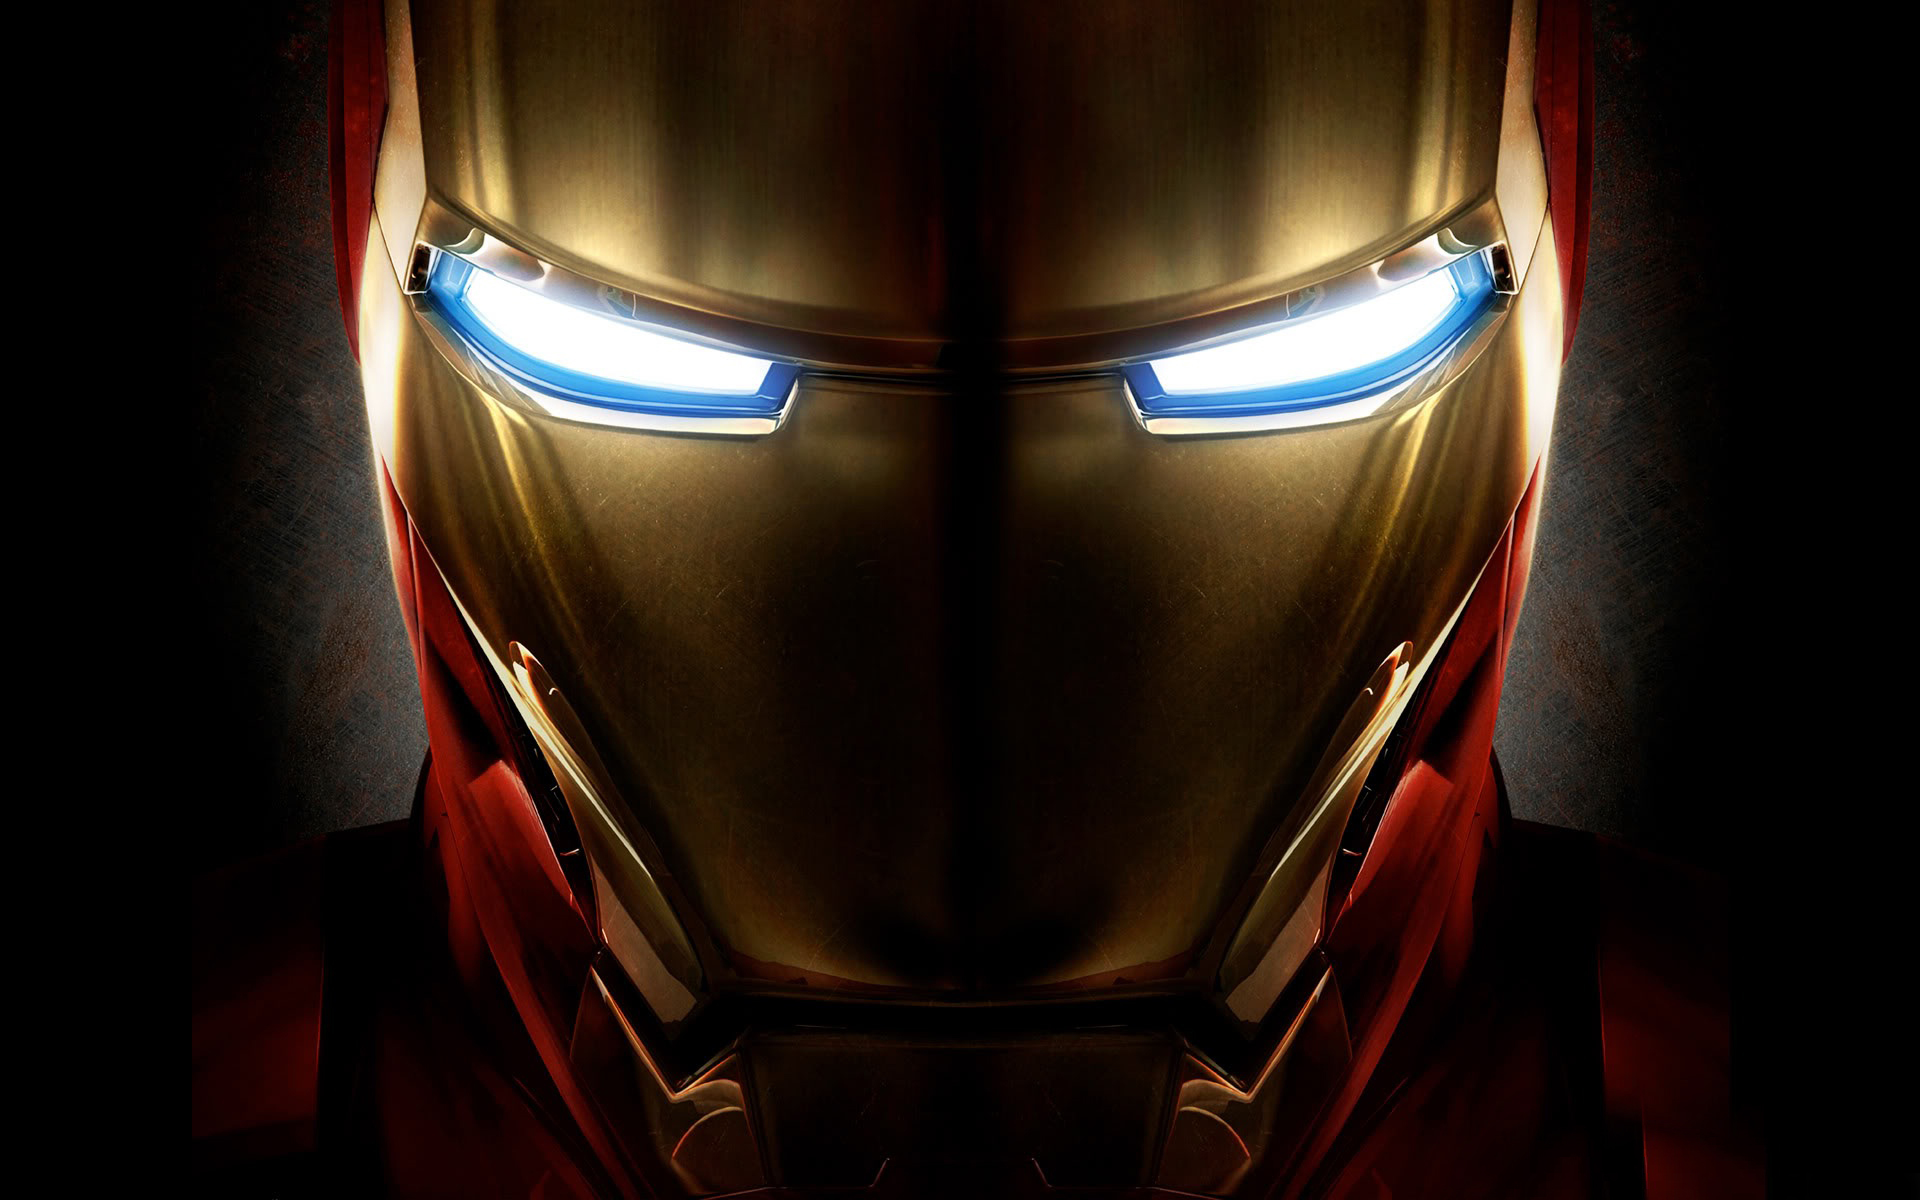 Iron Man Computer Wallpaper